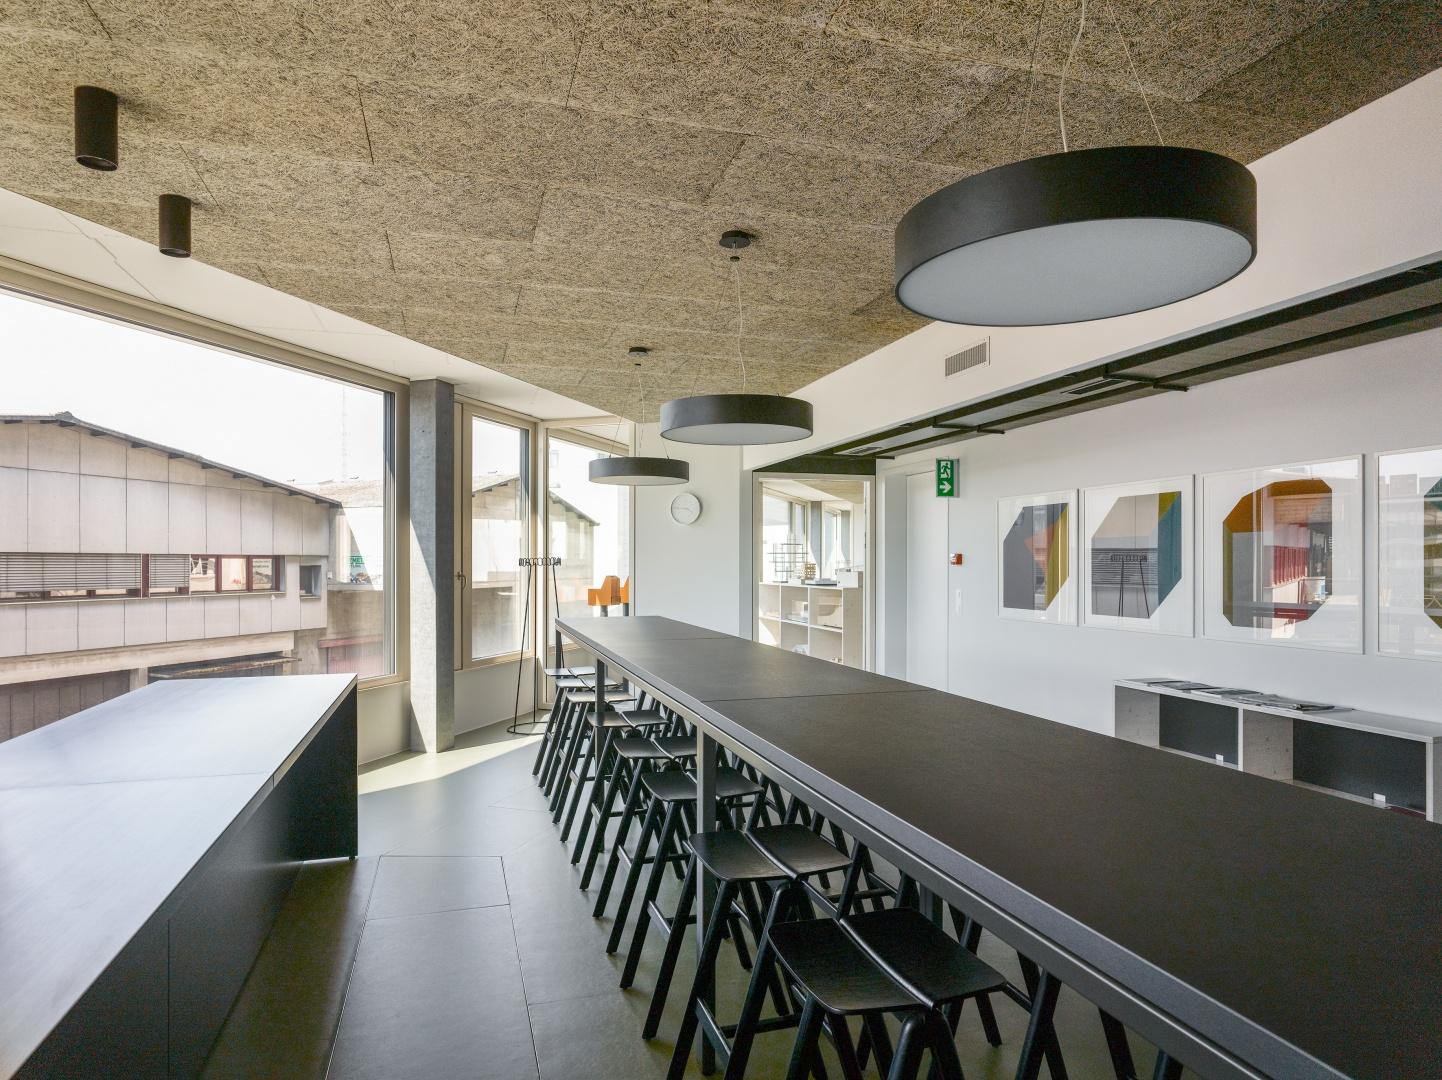 Cafeteria © Johannes Marburg, Genf